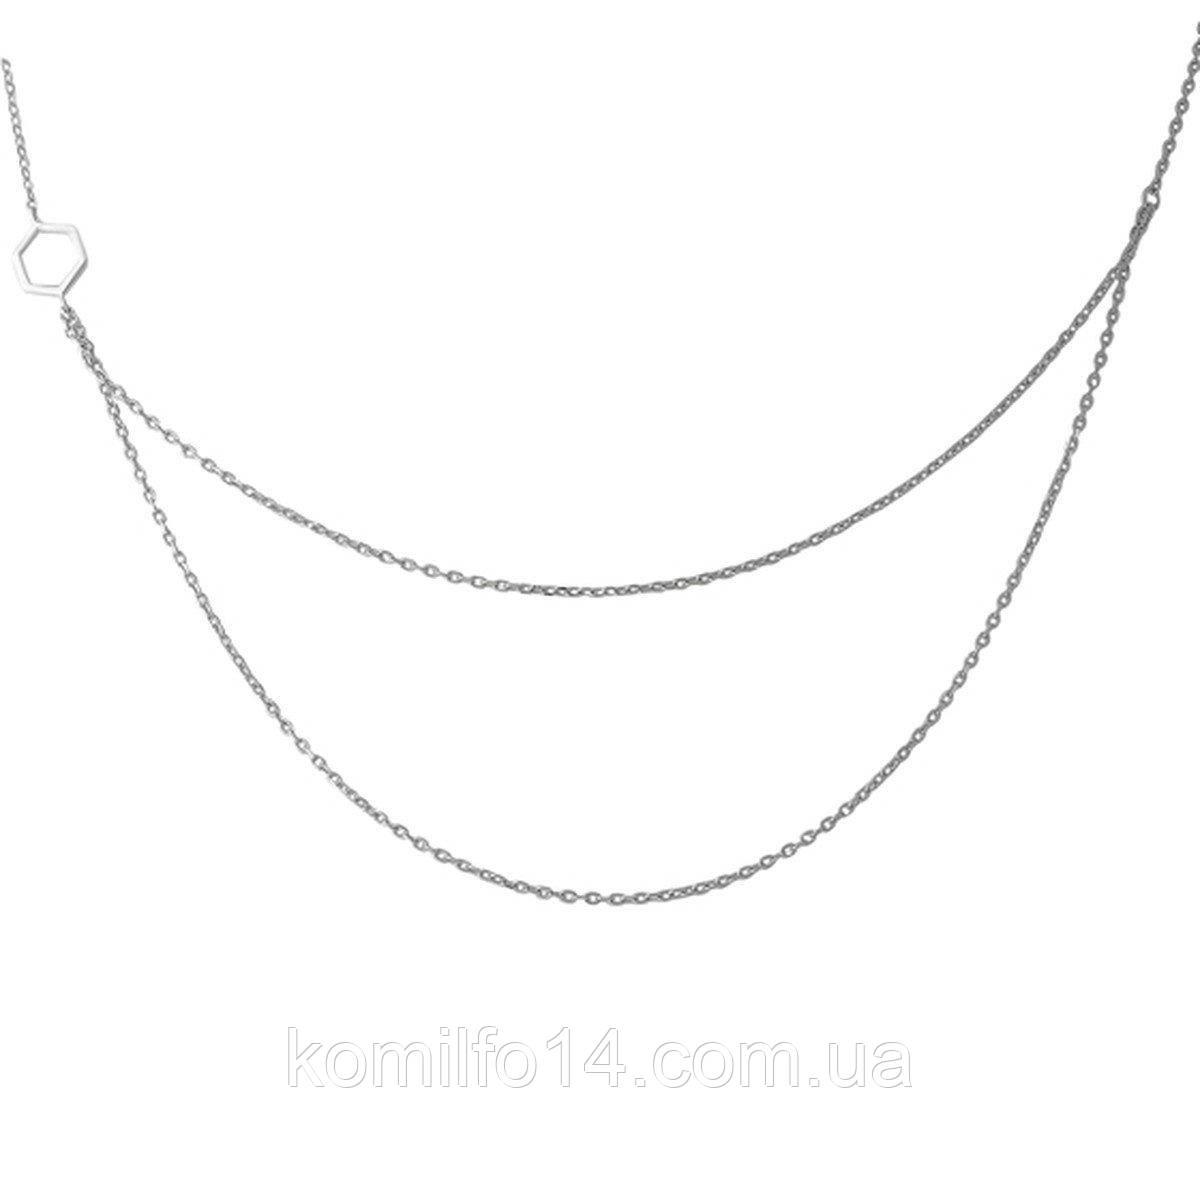 Серебряное колье Komilfo без камней (1966938) 7578 размер